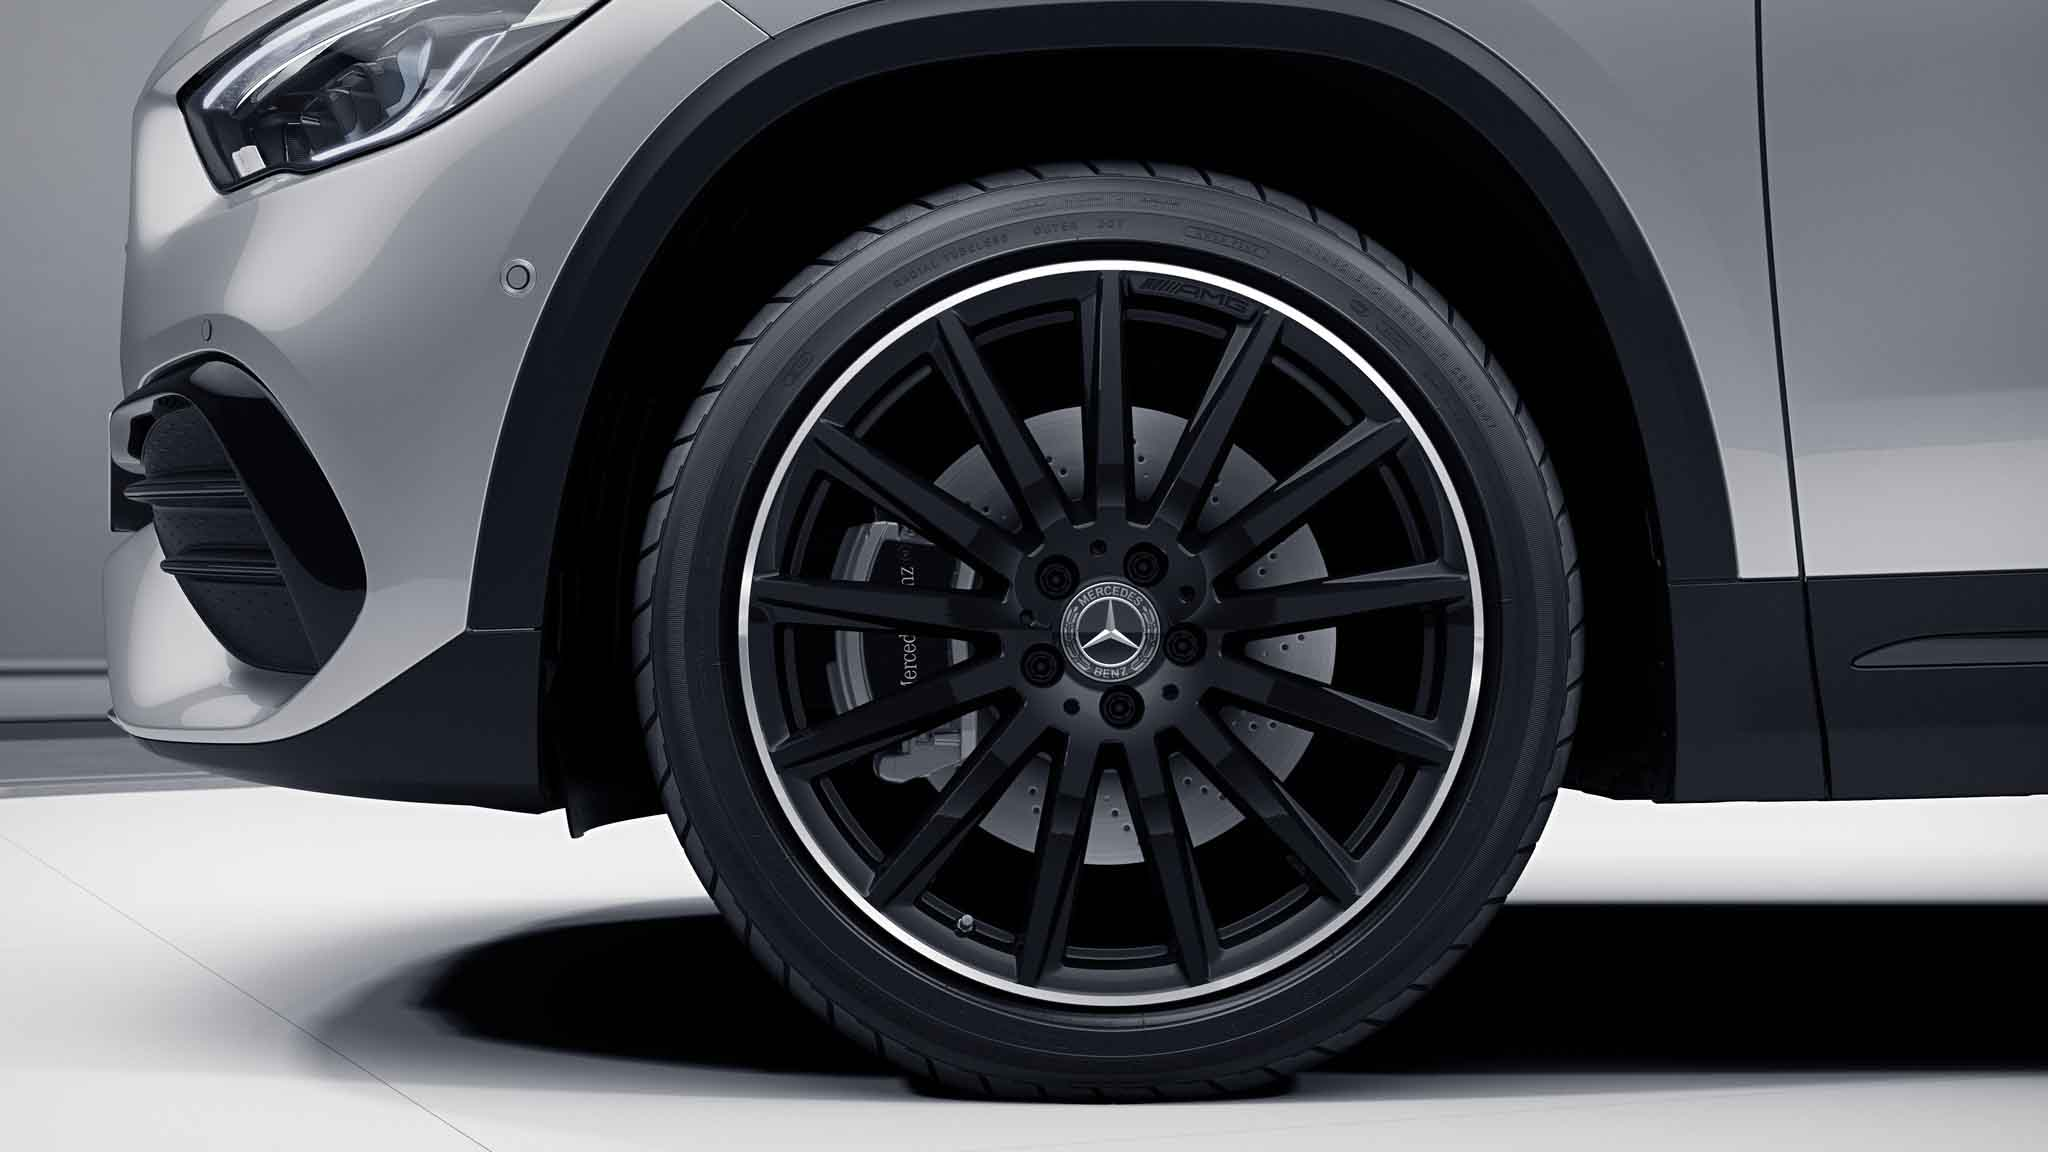 Jantes AMG 20 multibranches noires de la Mercedes-Benz GLA